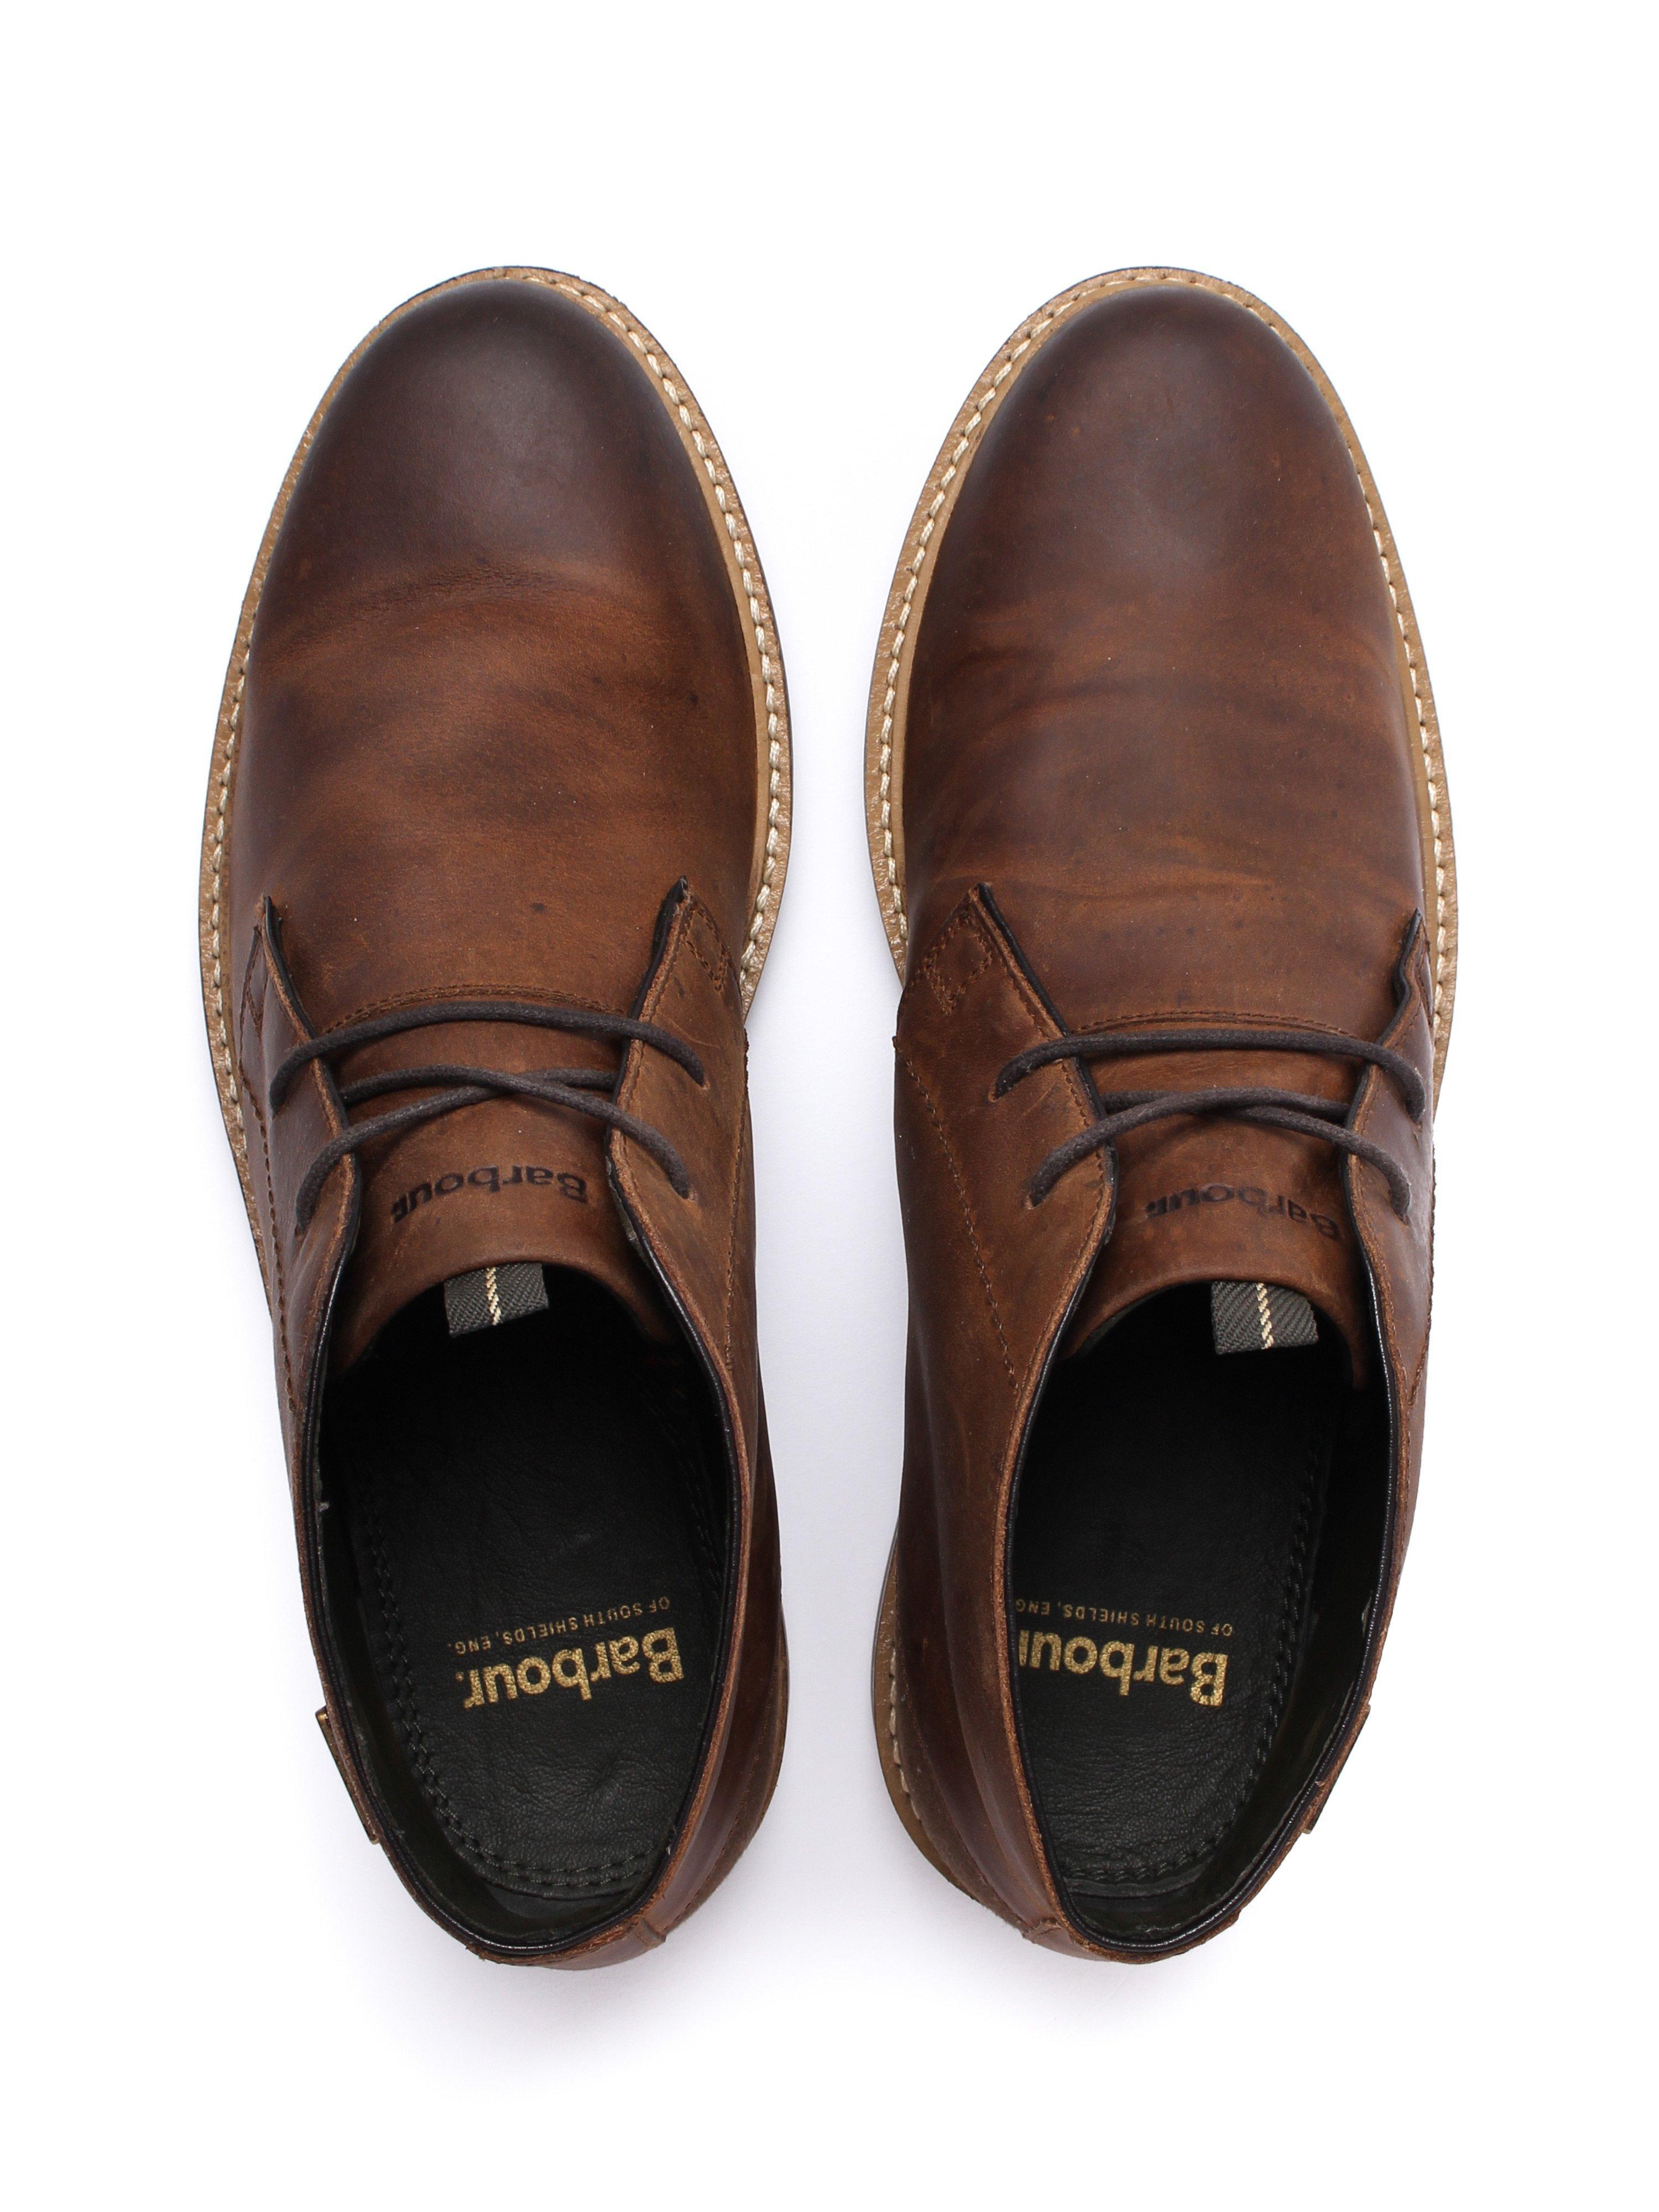 Barbour Men's Readhead Leather Chukka Boots - Tan